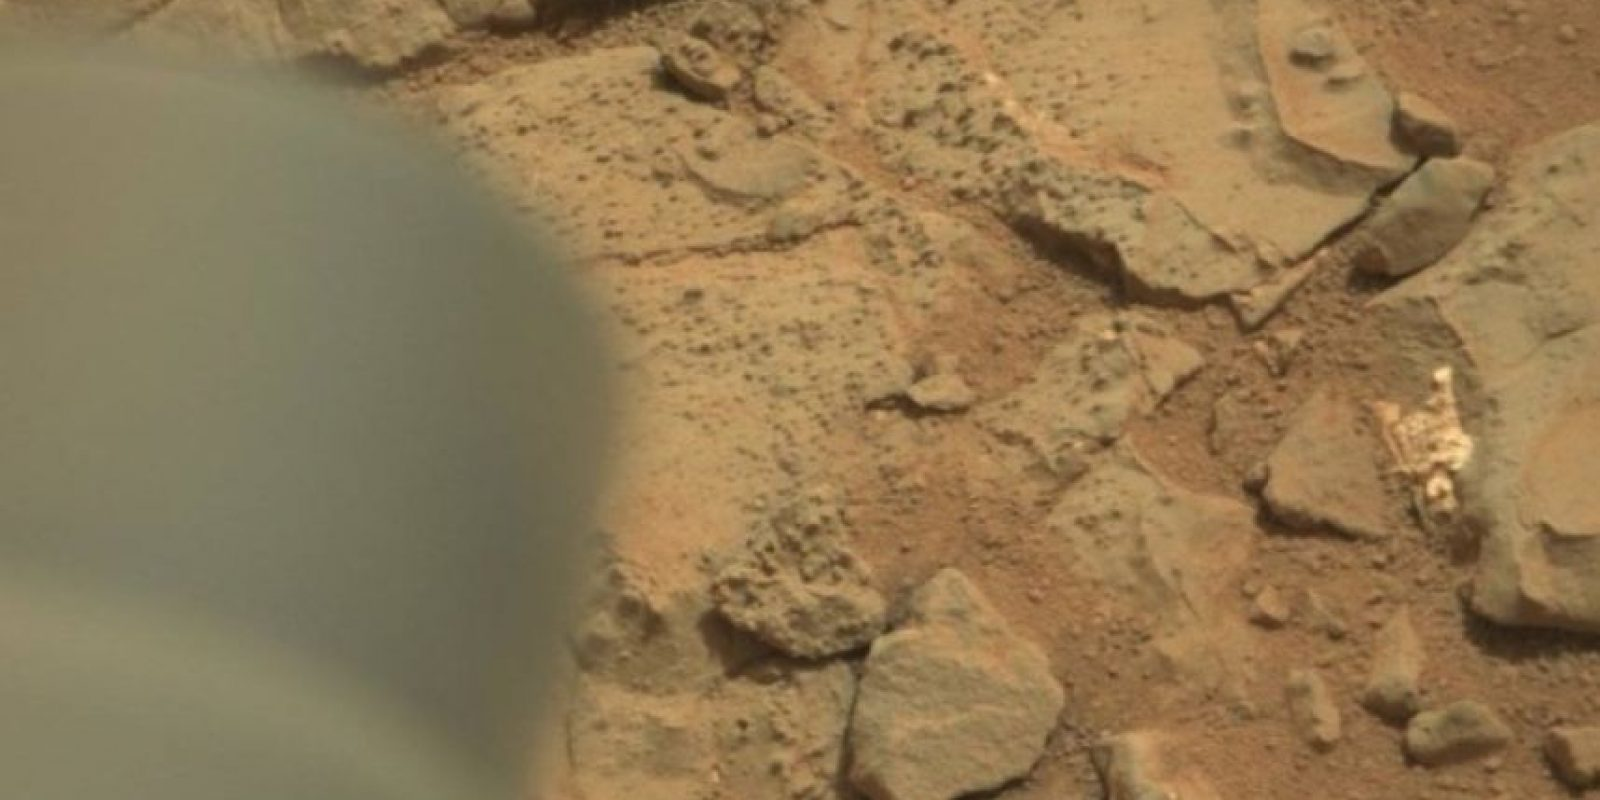 Esta es la imagen difundida por la NASA Foto:Foto original en http://mars.jpl.nasa.gov/msl-raw-images/msss/00153/mcam/0153MR0008470180201260E01_DXXX.jpg